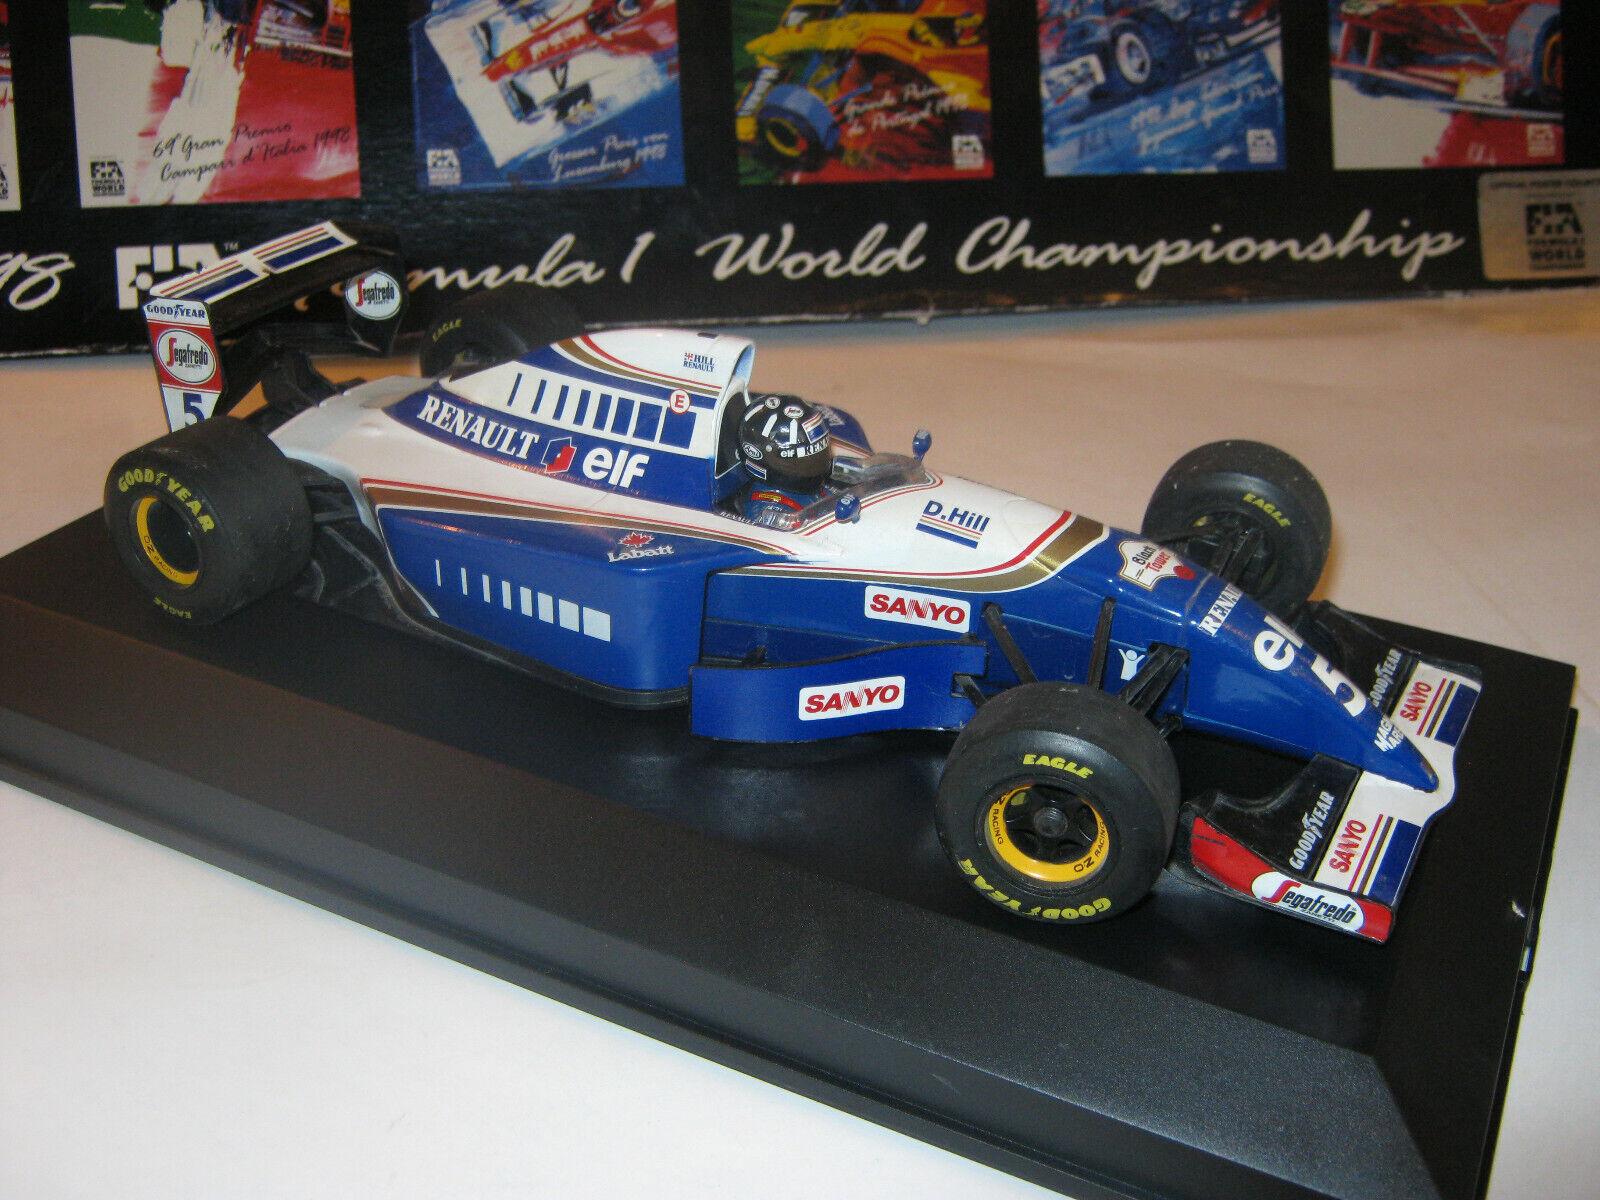 1 18 Williams Renault FW16 D. Hill 1994 Sanyo Minichamps in BRANDNEW Showcase